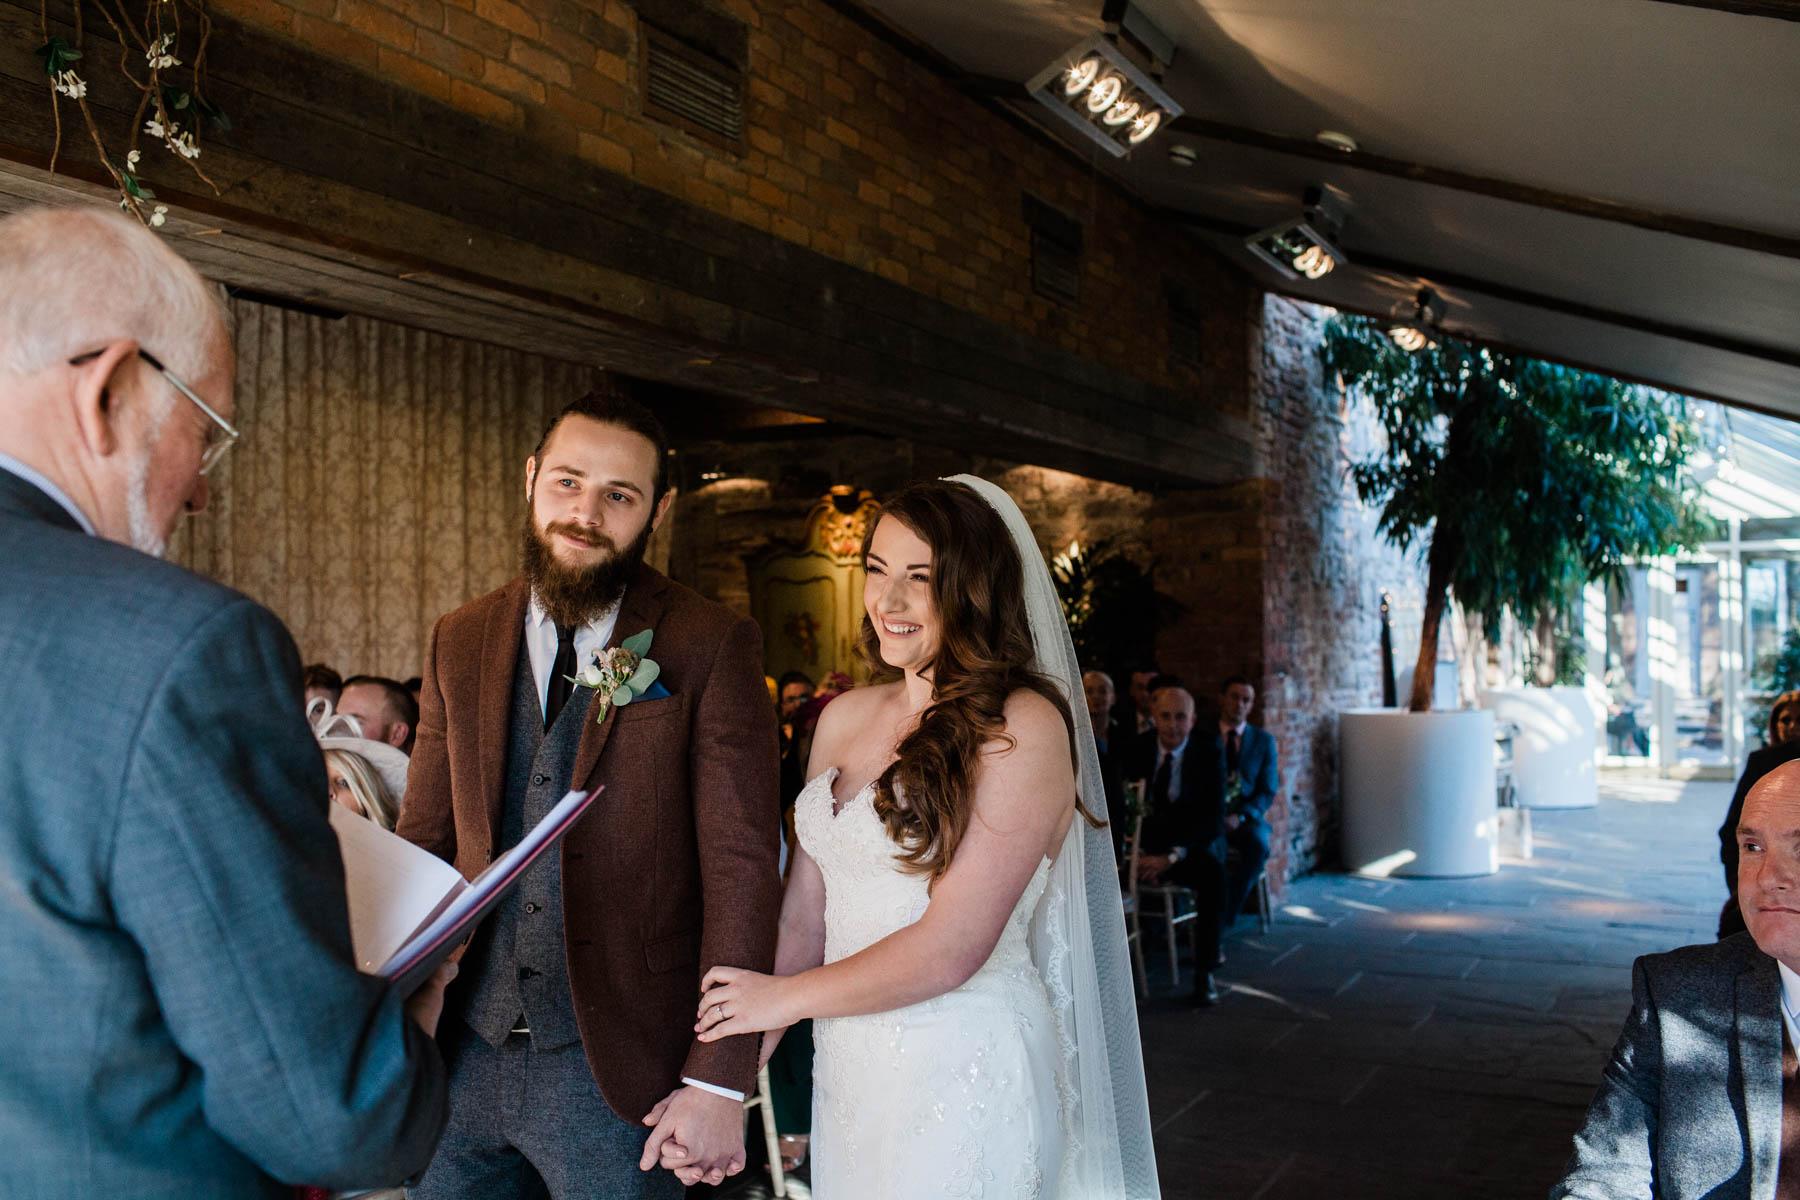 newton hall weddings - Newcastle wedding photographer - vows